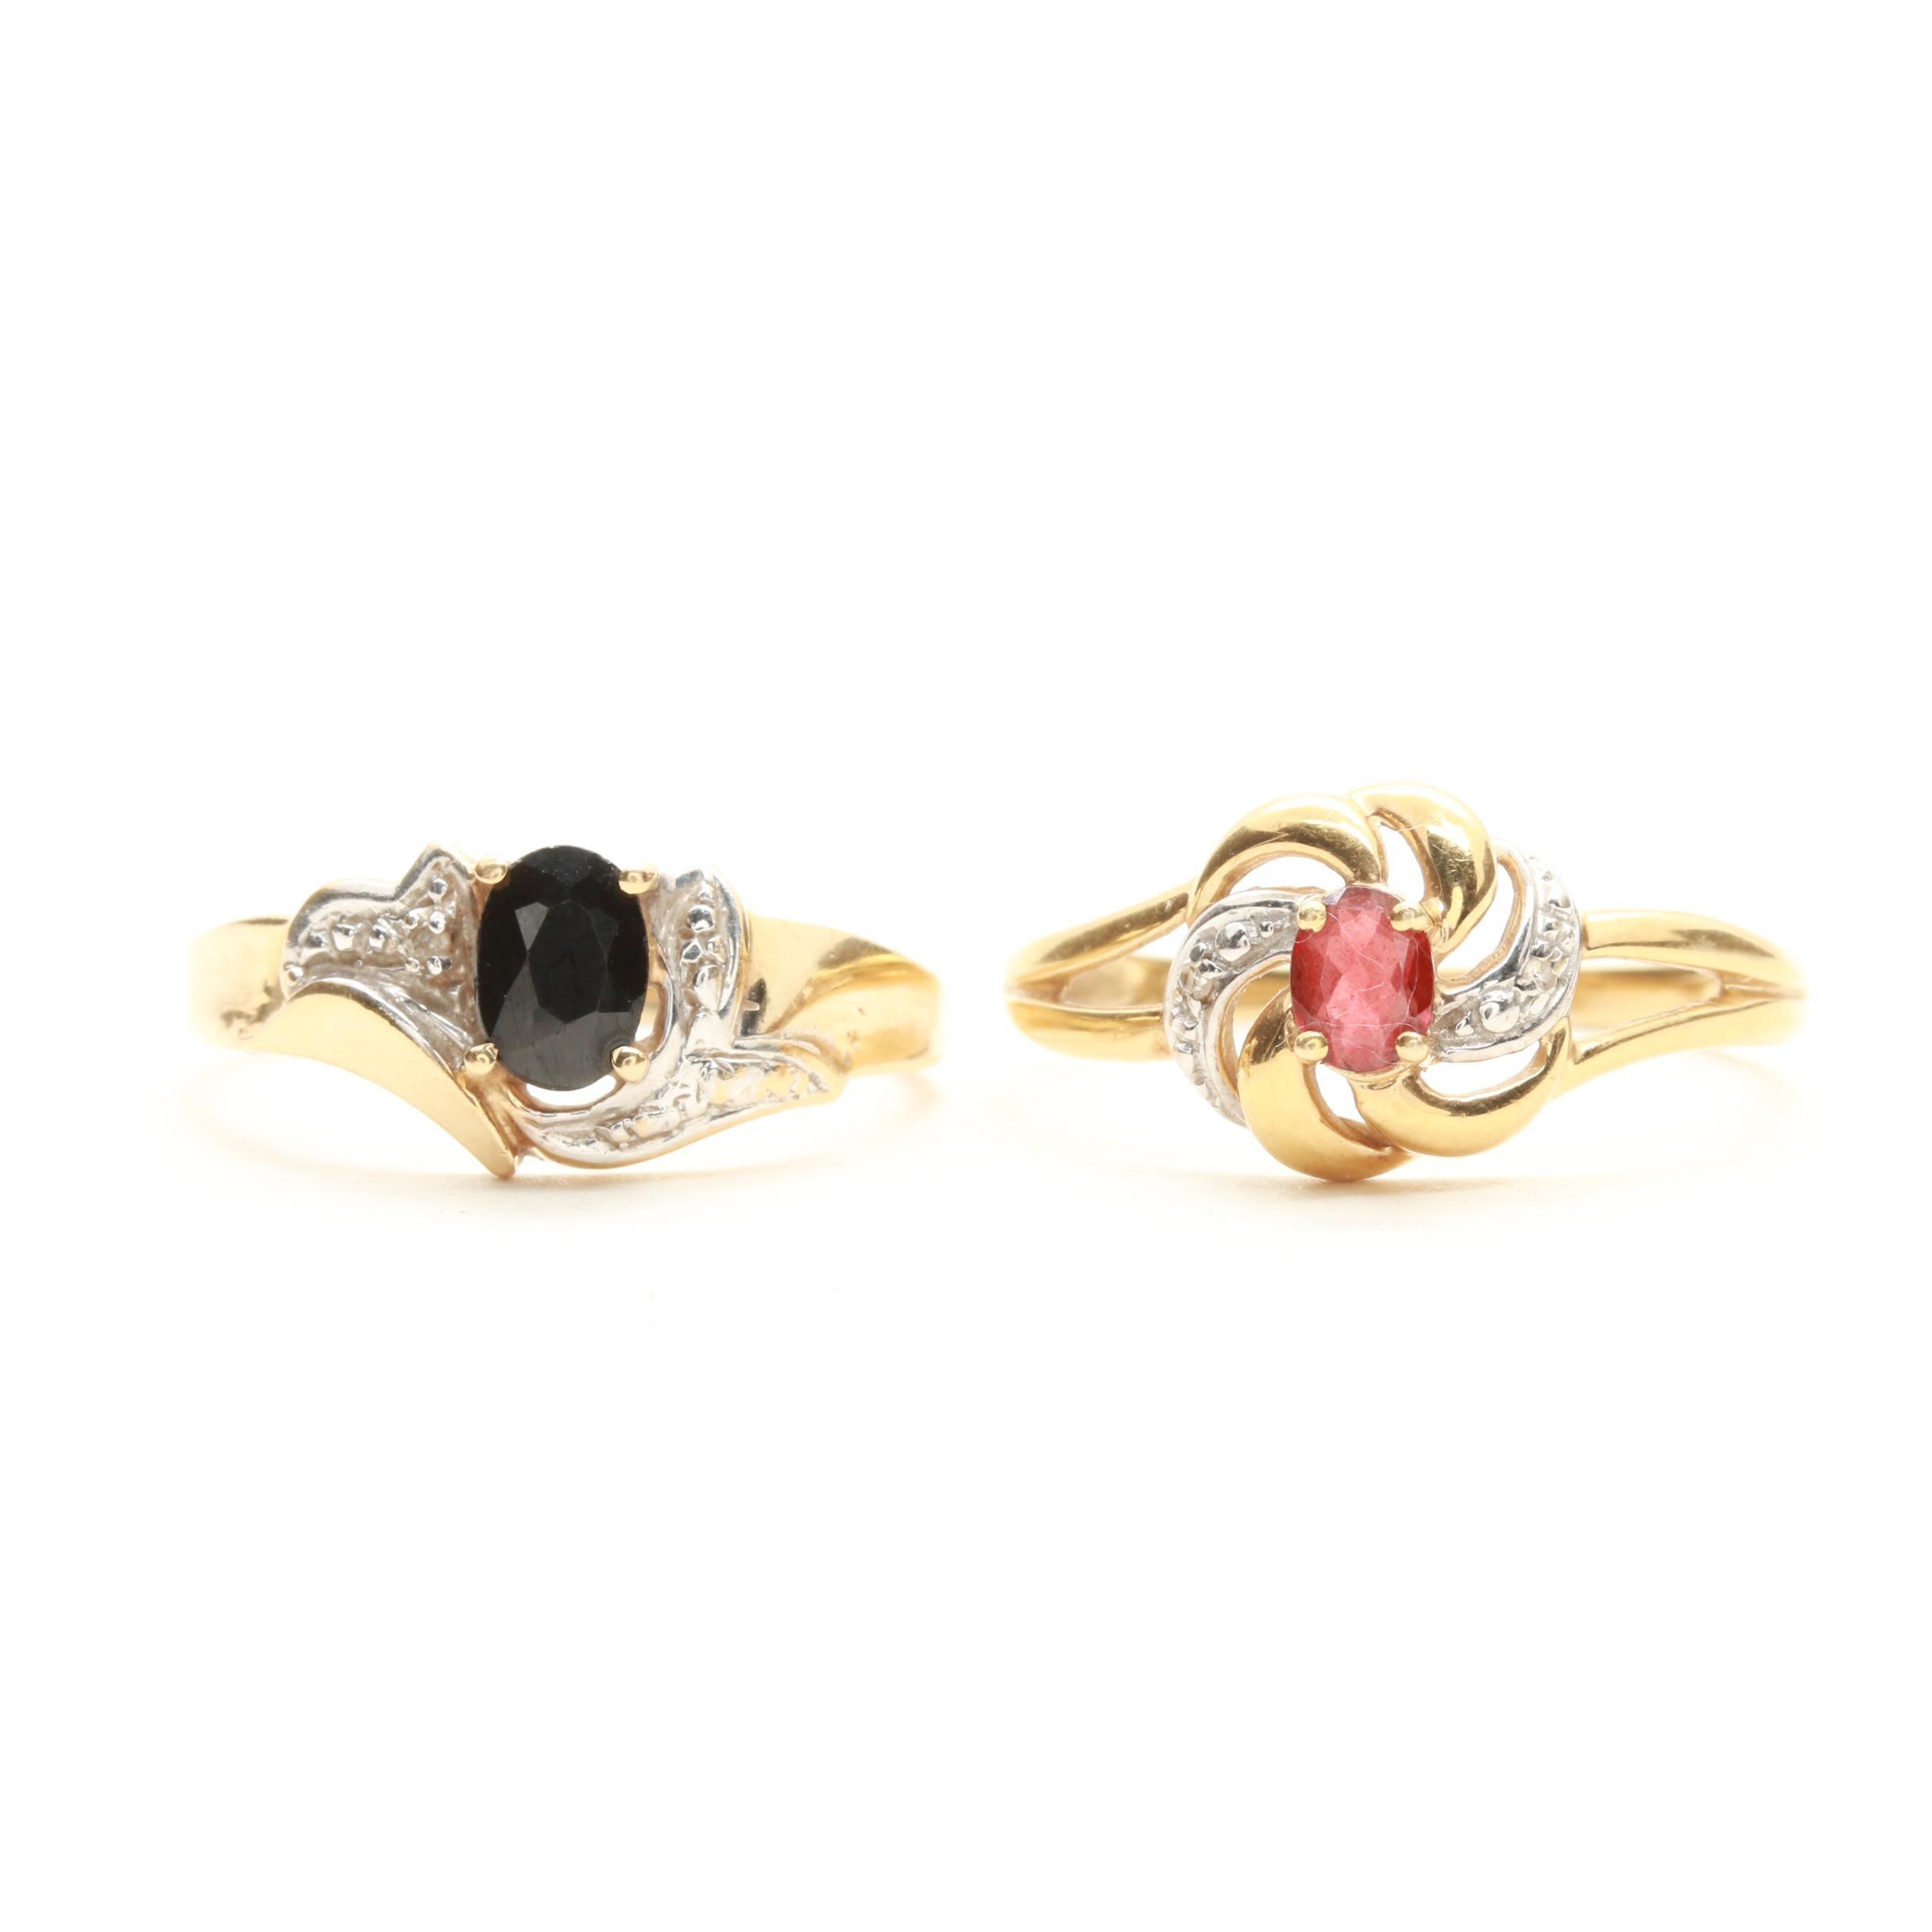 10K Yellow Gold Garnet, Black Spinel and Diamond Rings